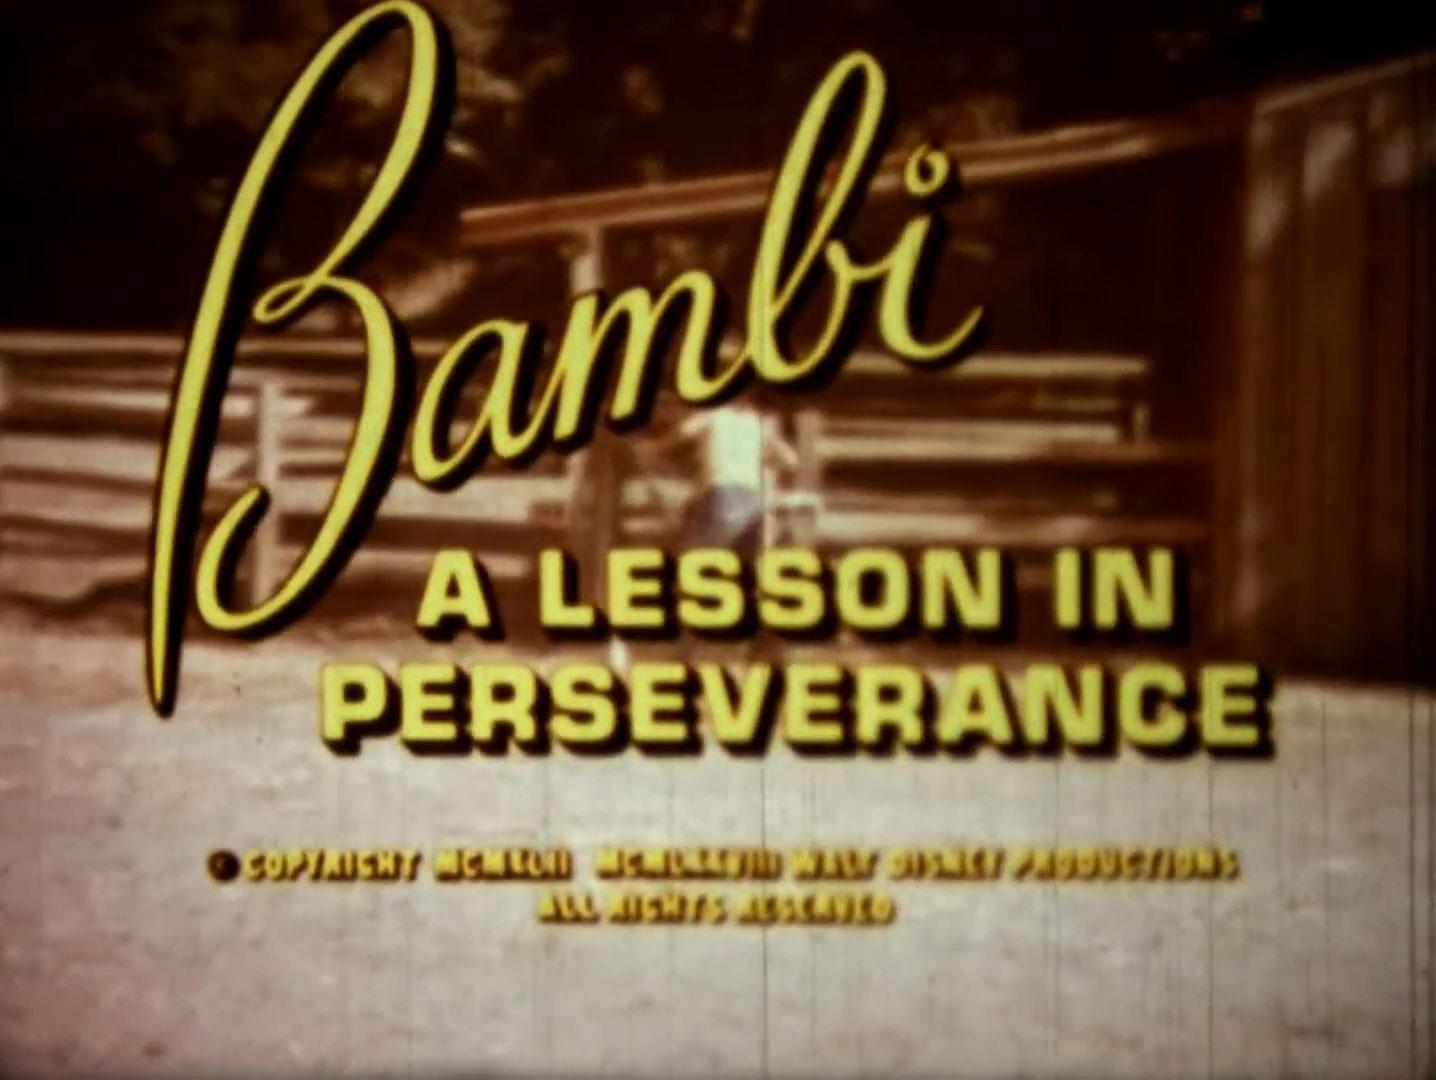 affiche poster bambi lesson perserverance disney